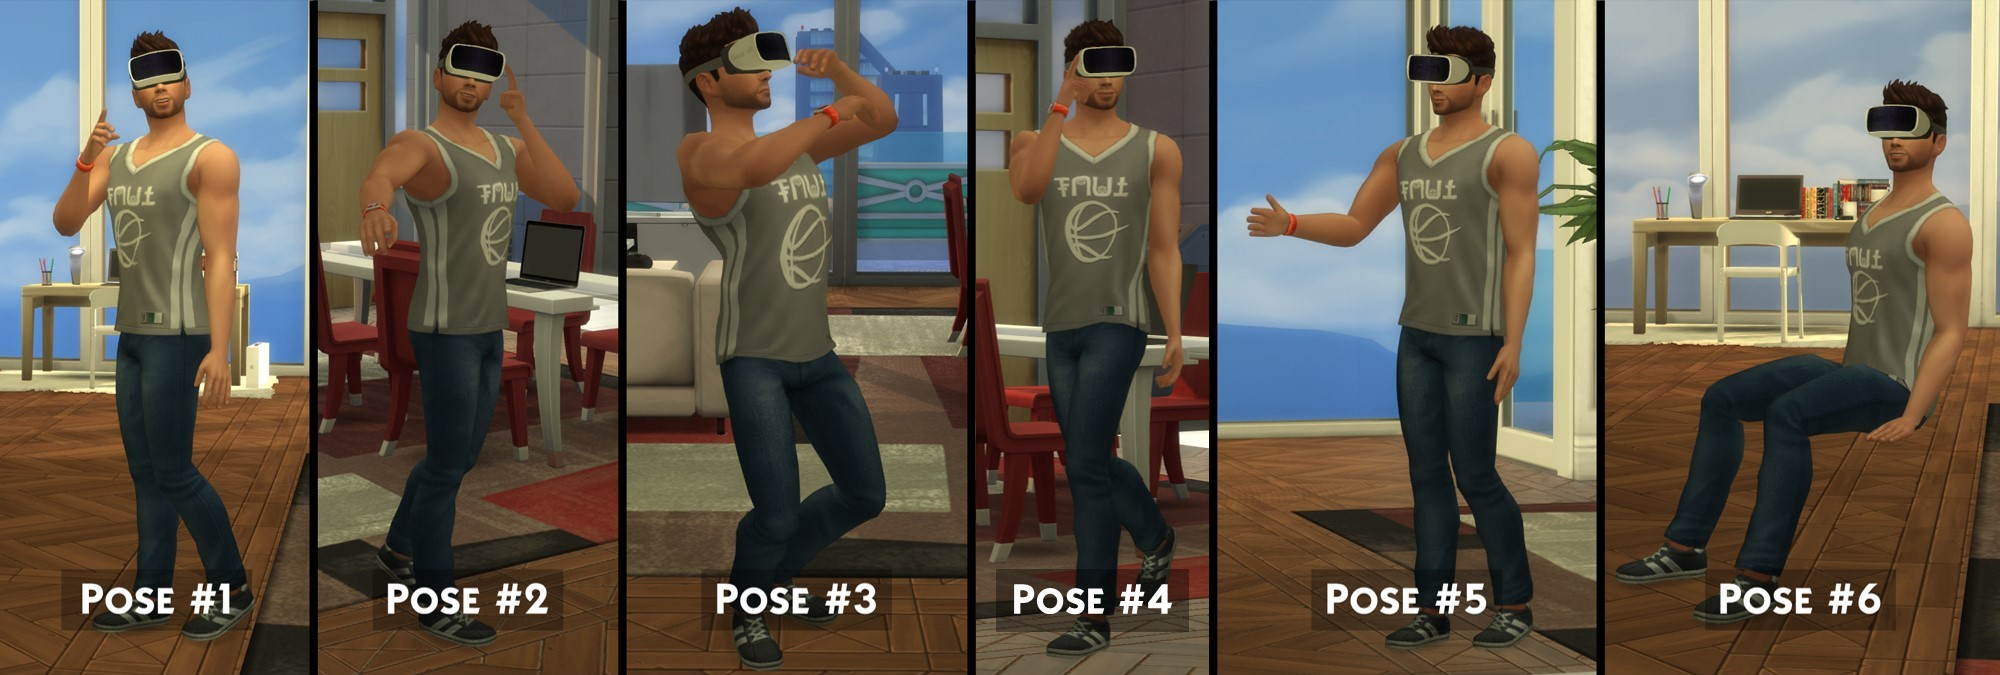 Mod The Sims - Samsung Gear VR [2015]